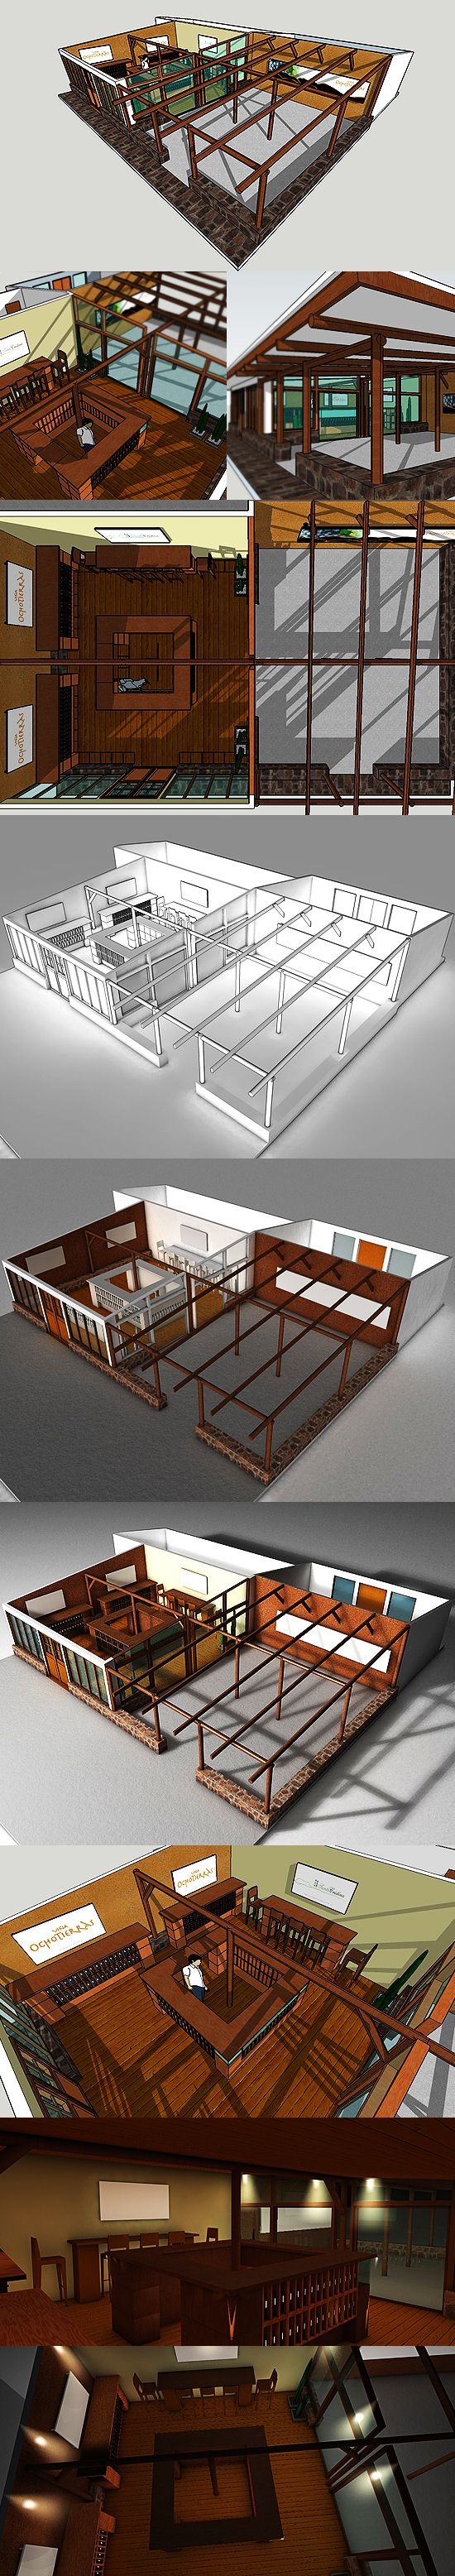 2009 - 8 Tierras on Behance #3D #design #sketchup #cinema4D